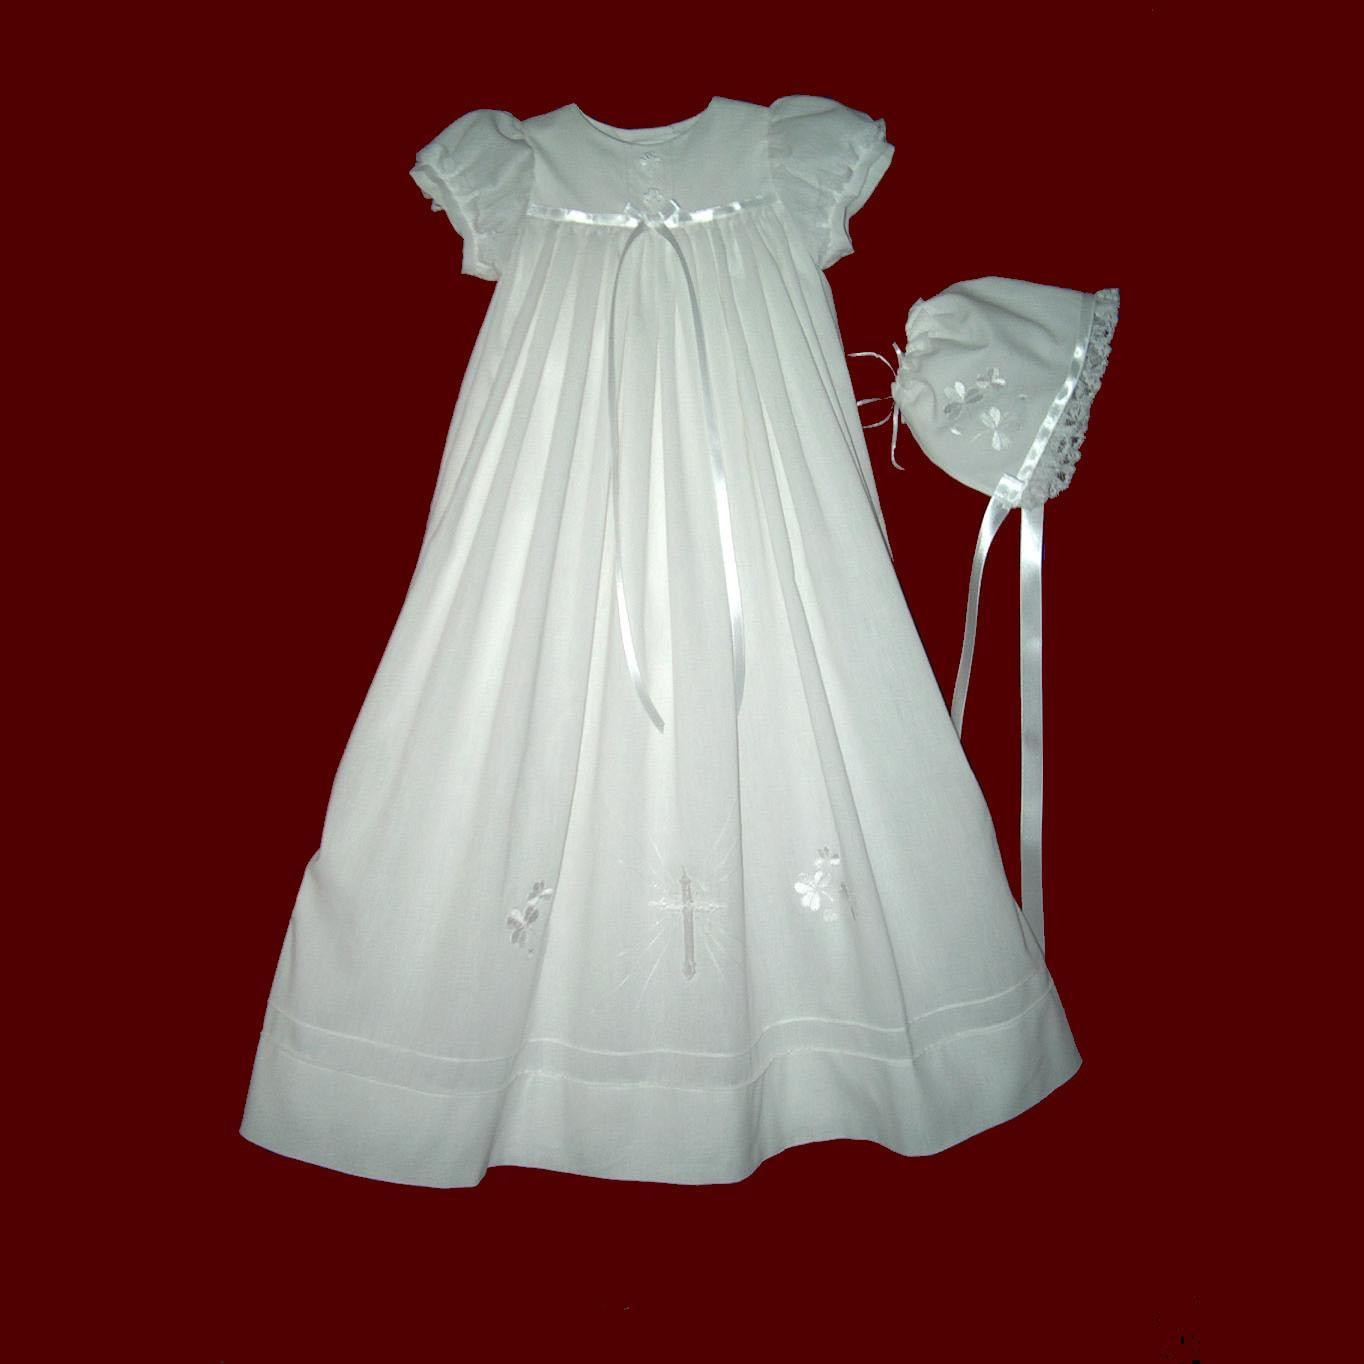 Irish Girls Christening Gowns - Smocked Treasures